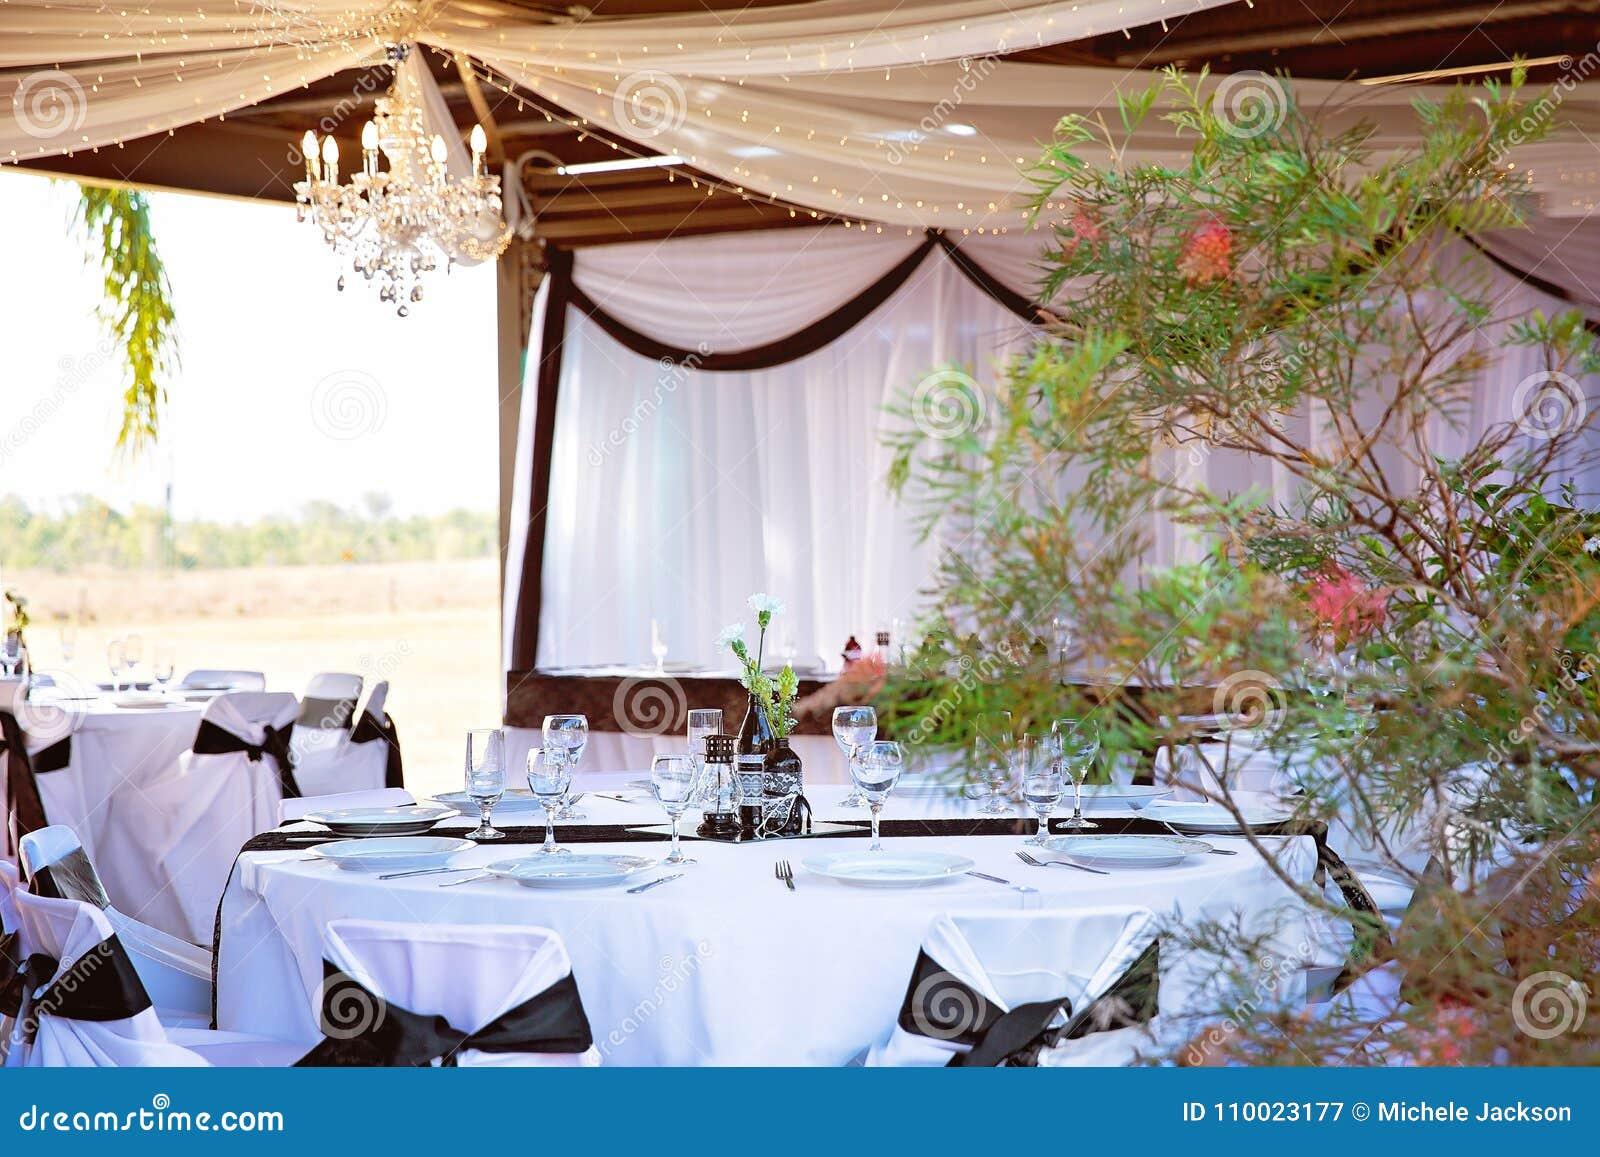 Wedding Reception Decor And Set Up Stock Image Image Of Reception